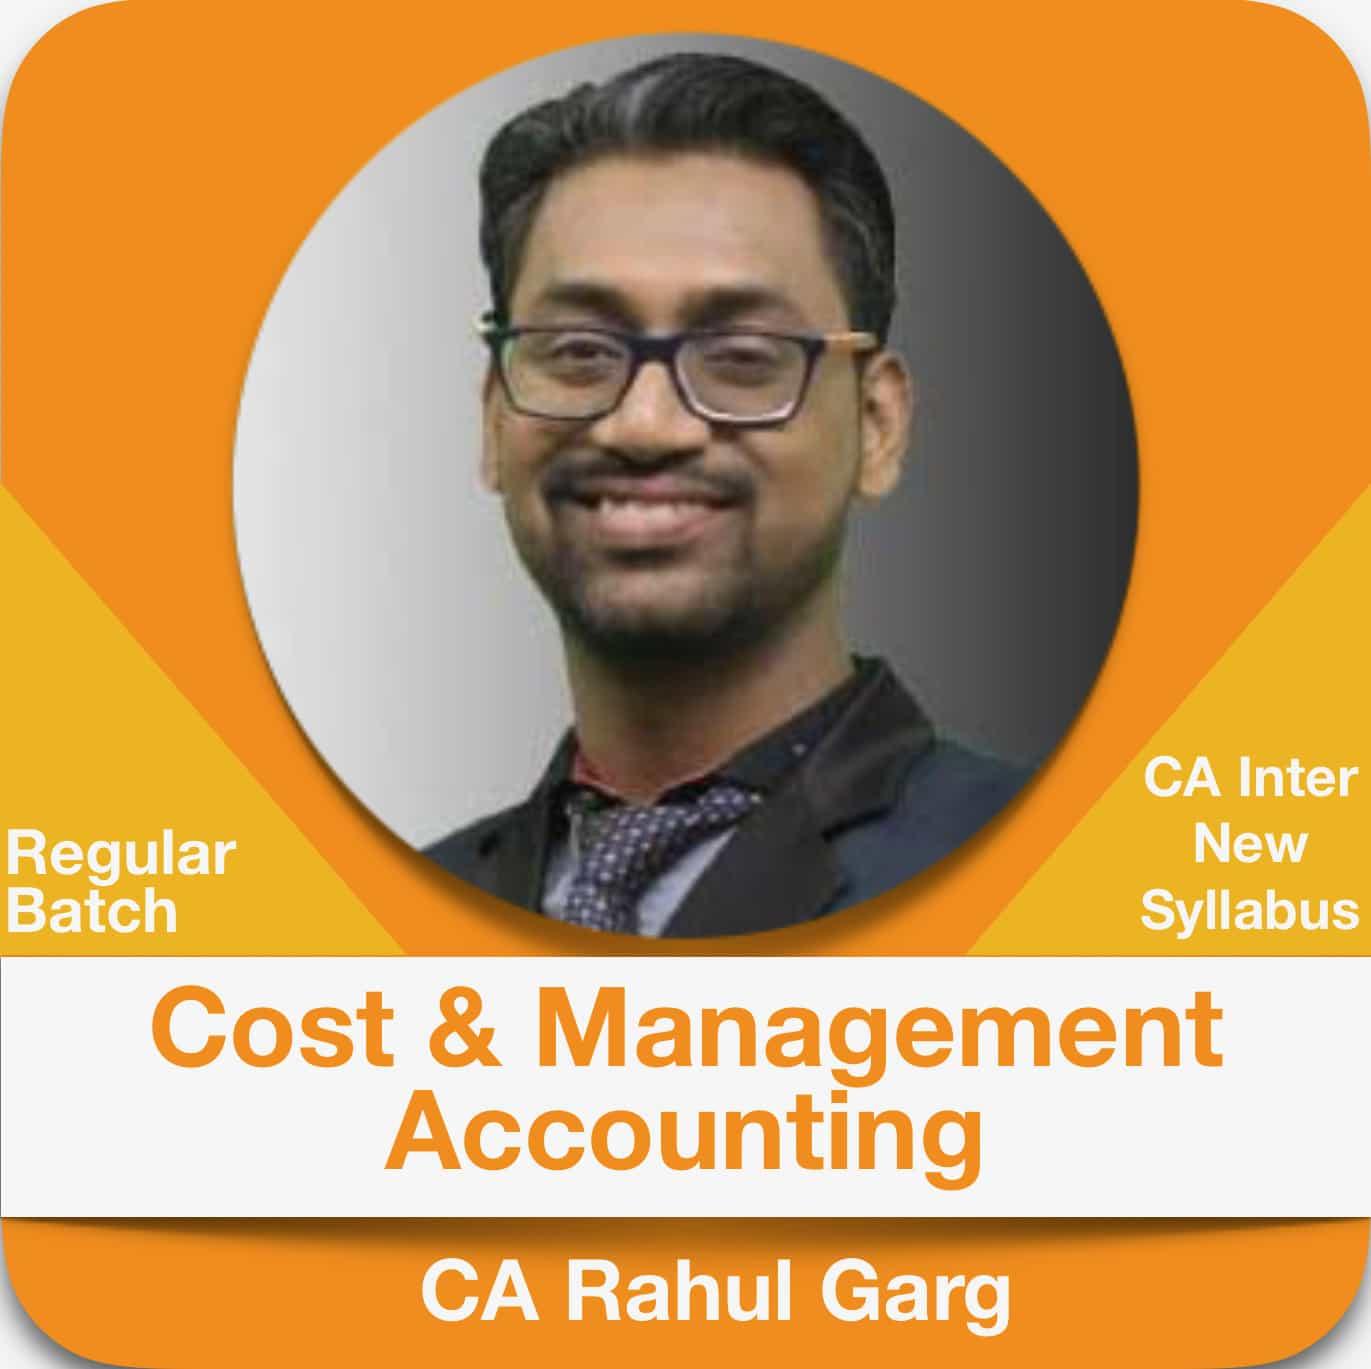 Cost & Management Accounting Regular Batch